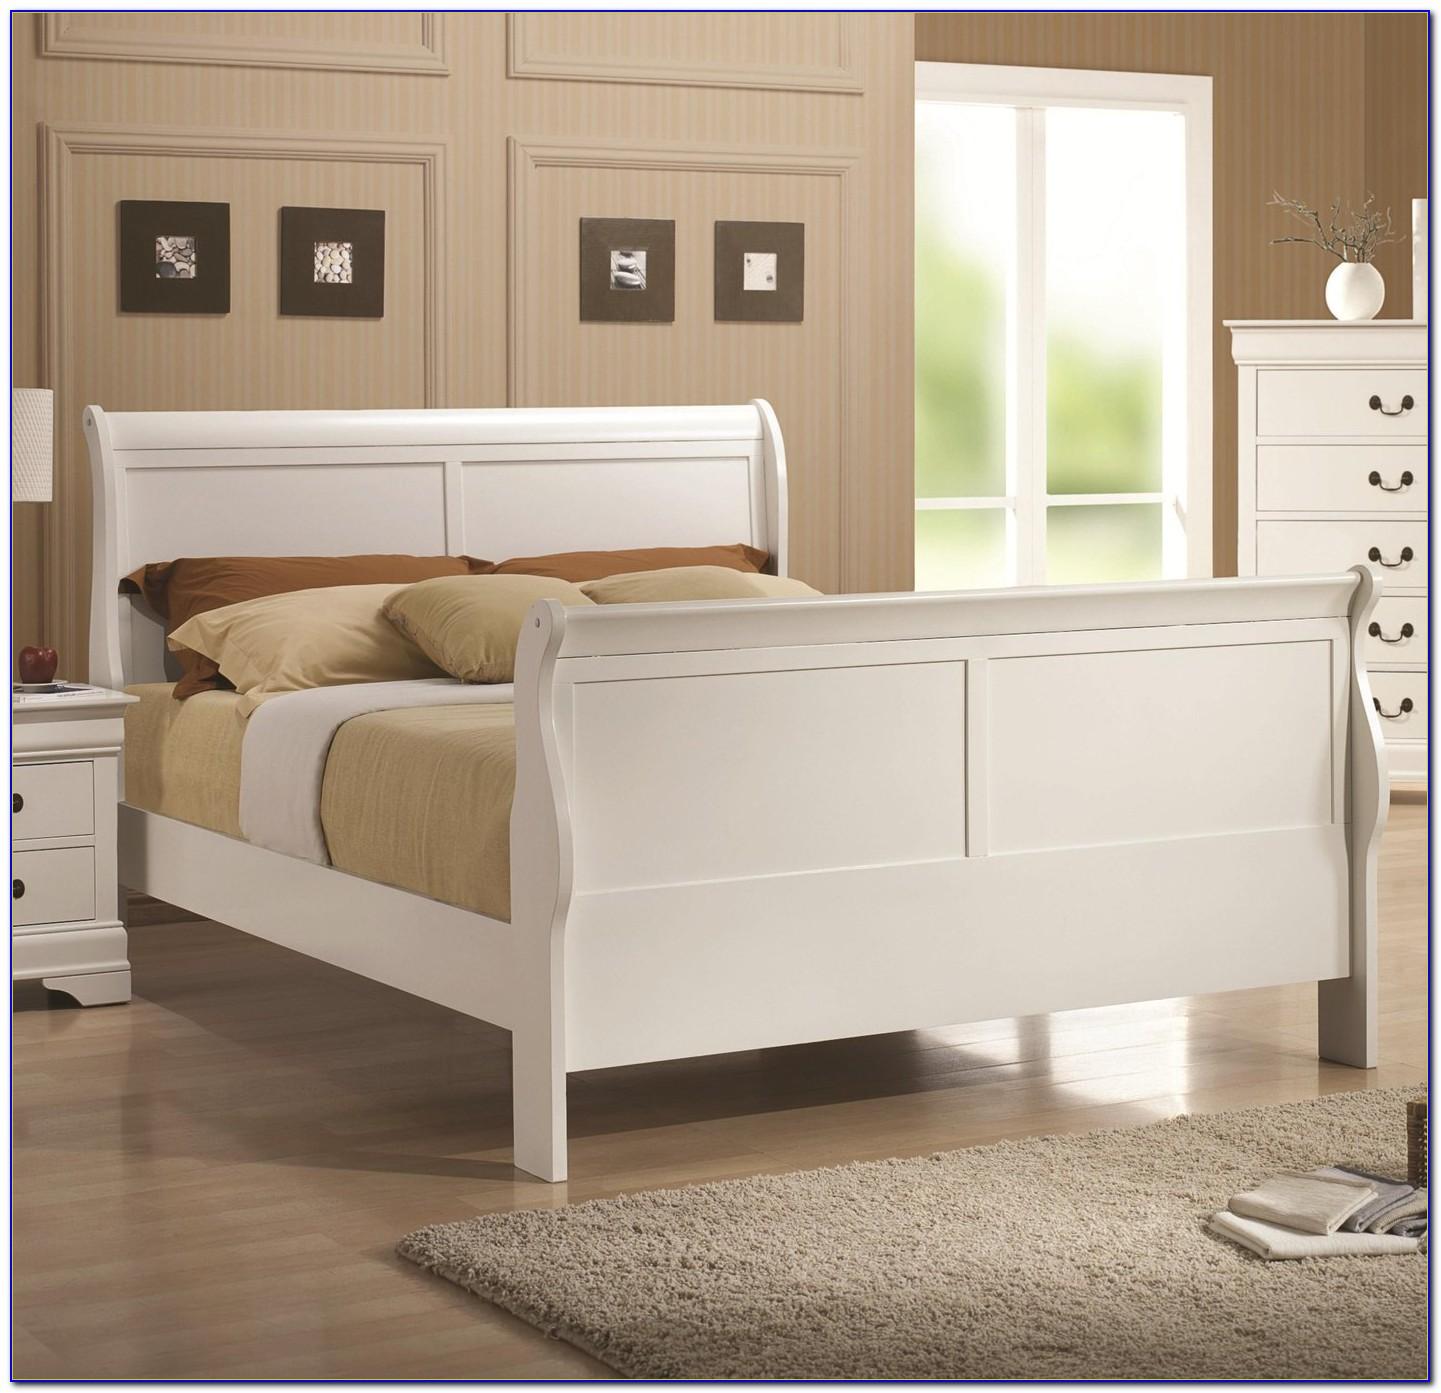 Sierra White 5 Piece Queen Size Bedroom Set